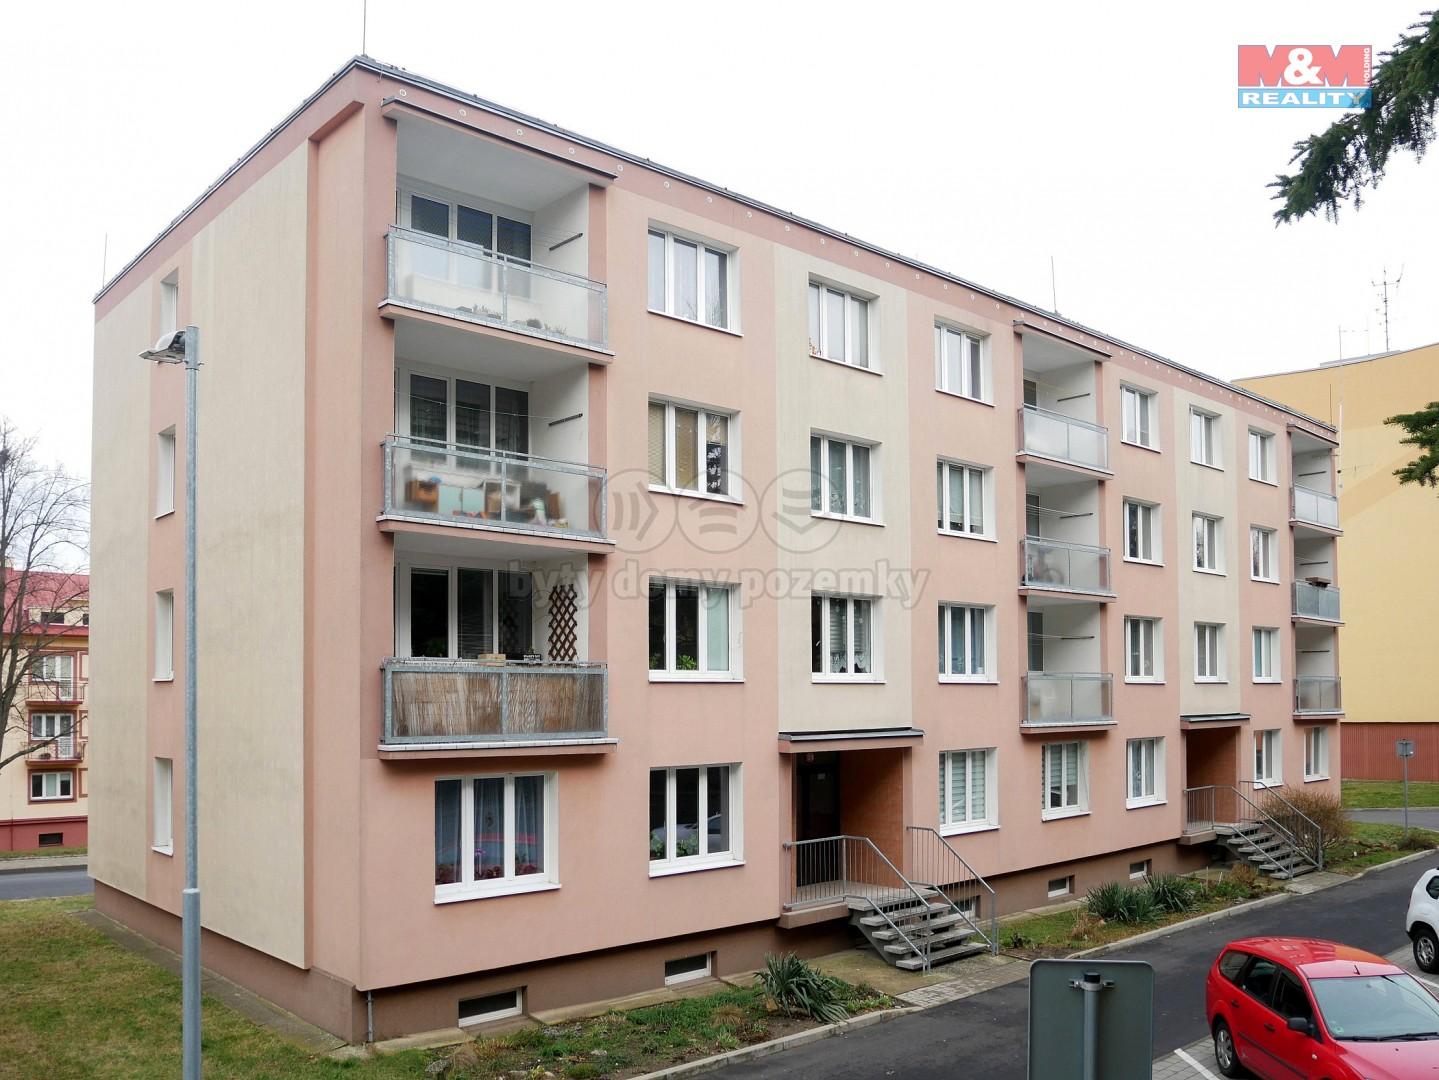 Prodej, byt 2+1, OV, 65 m2, Ostrov, ul. Lidická